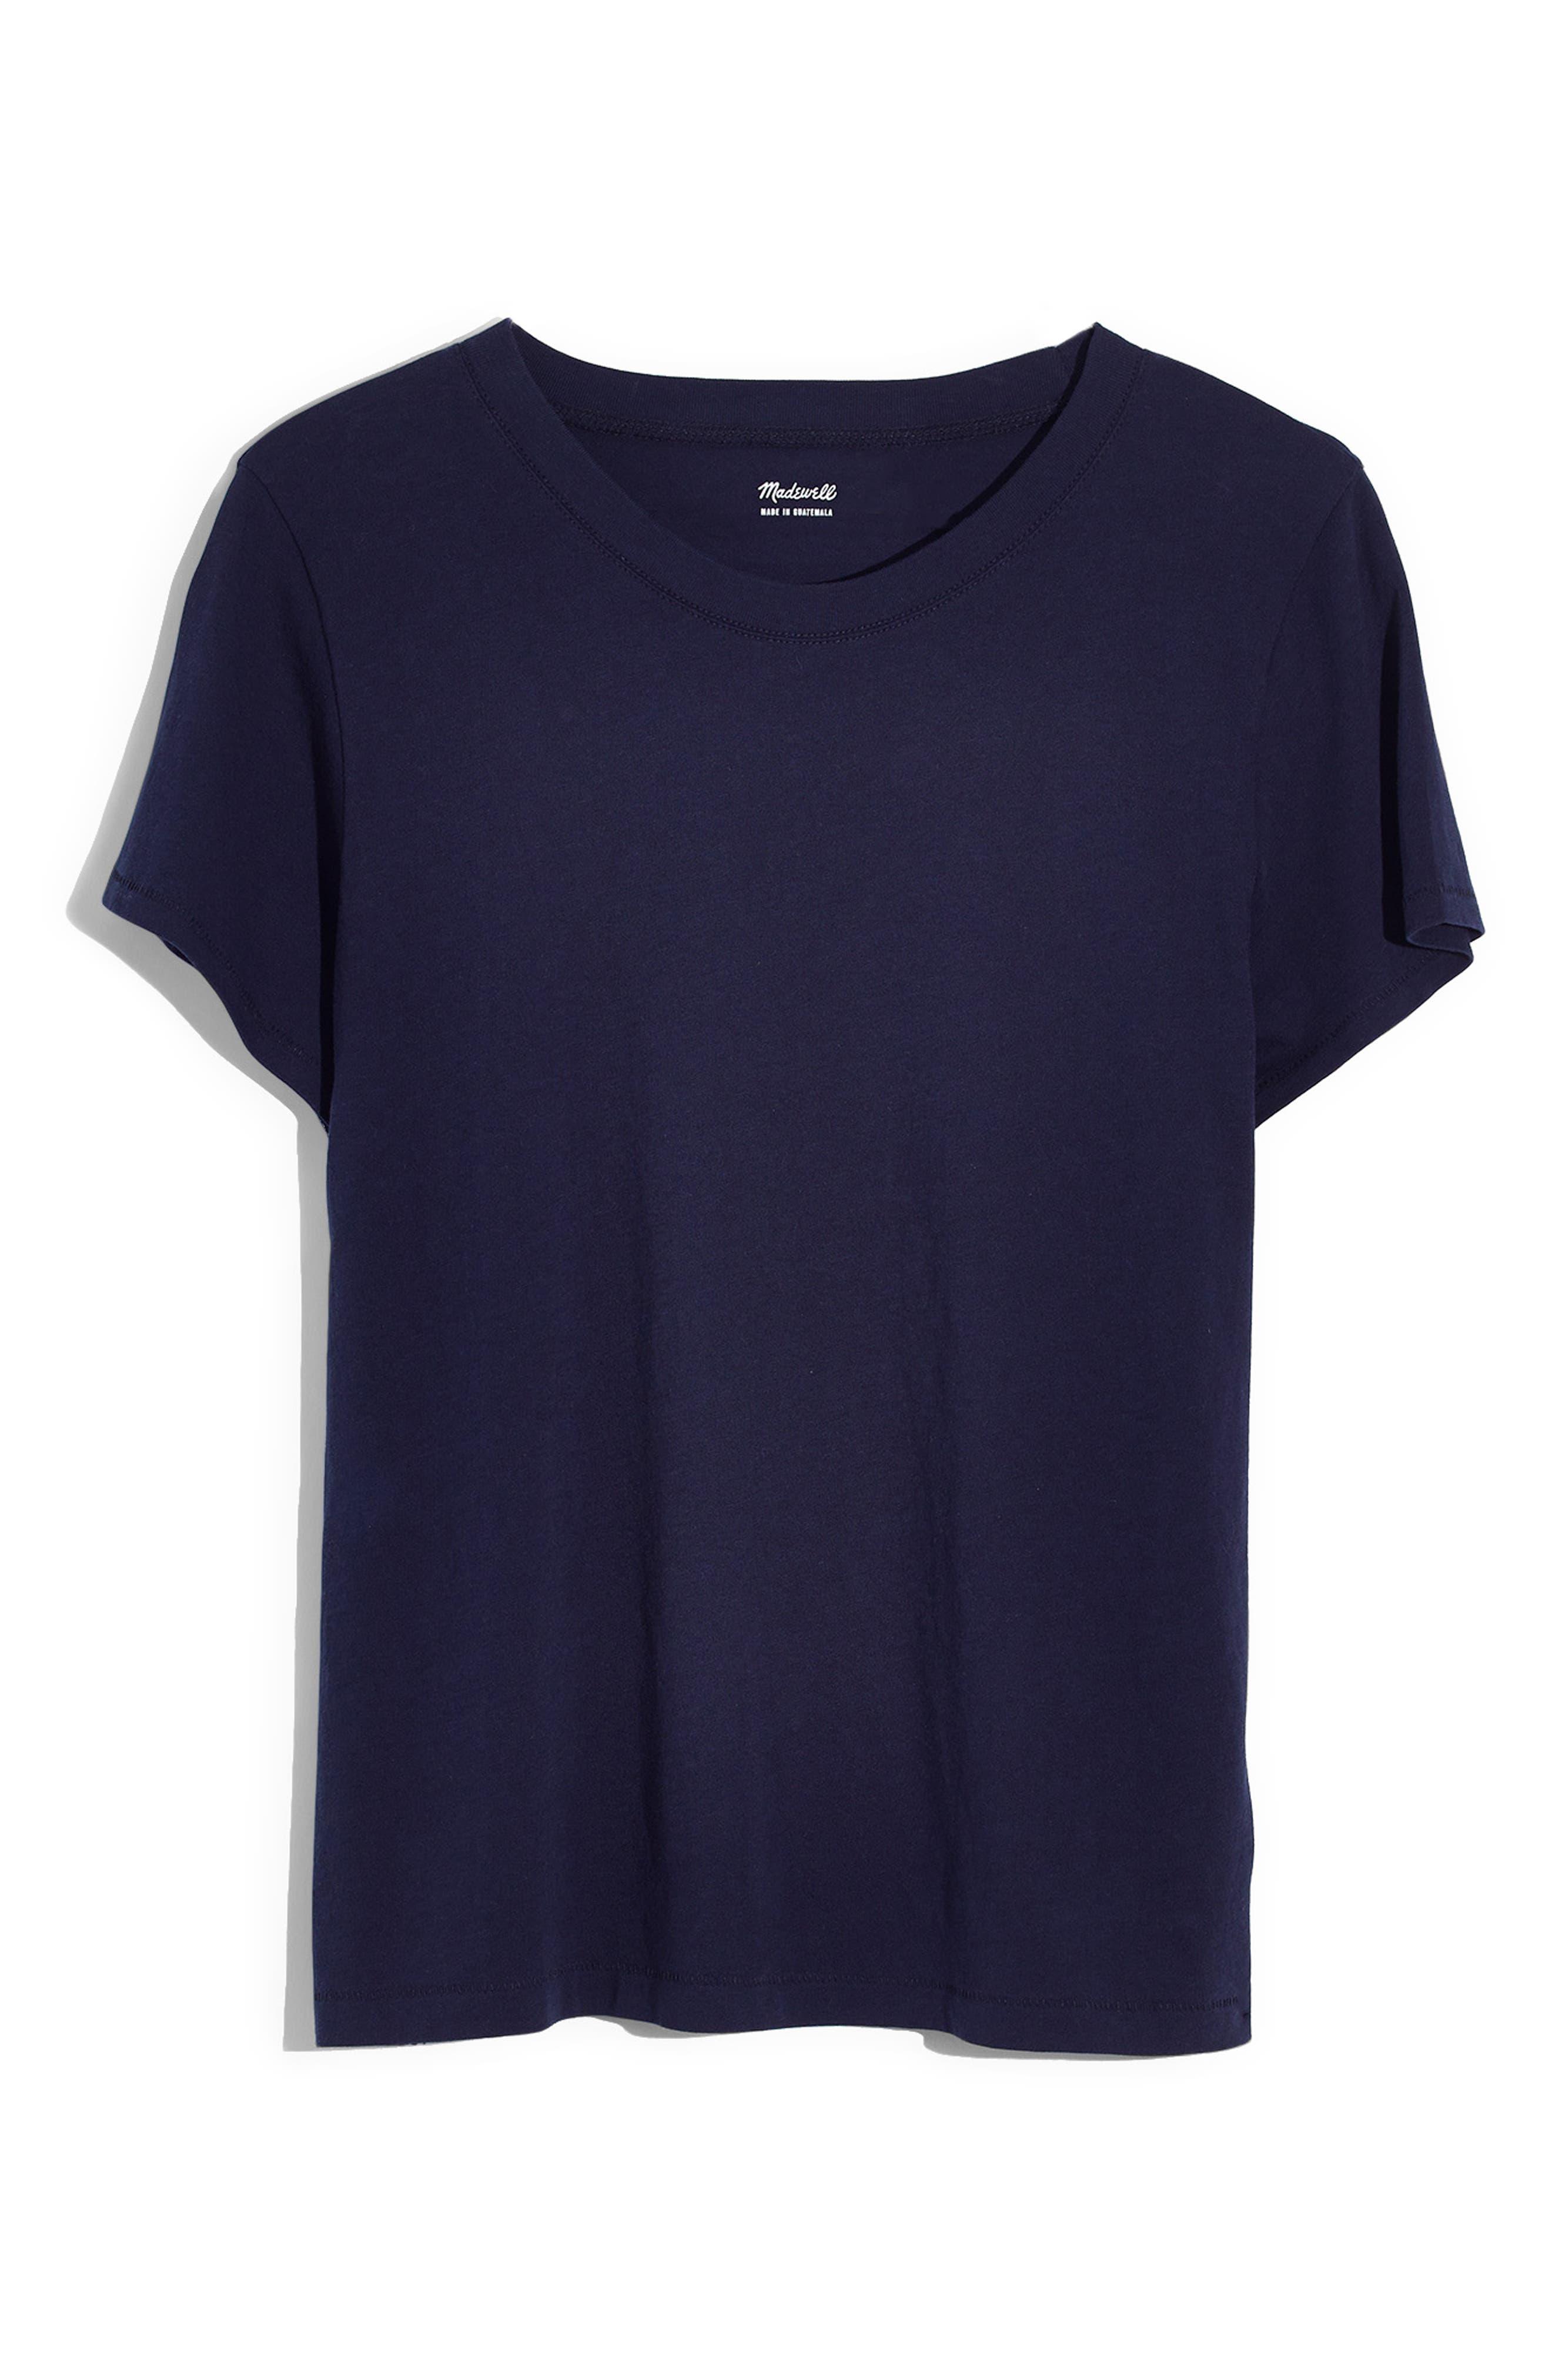 4874eed628 Madewell Clothing